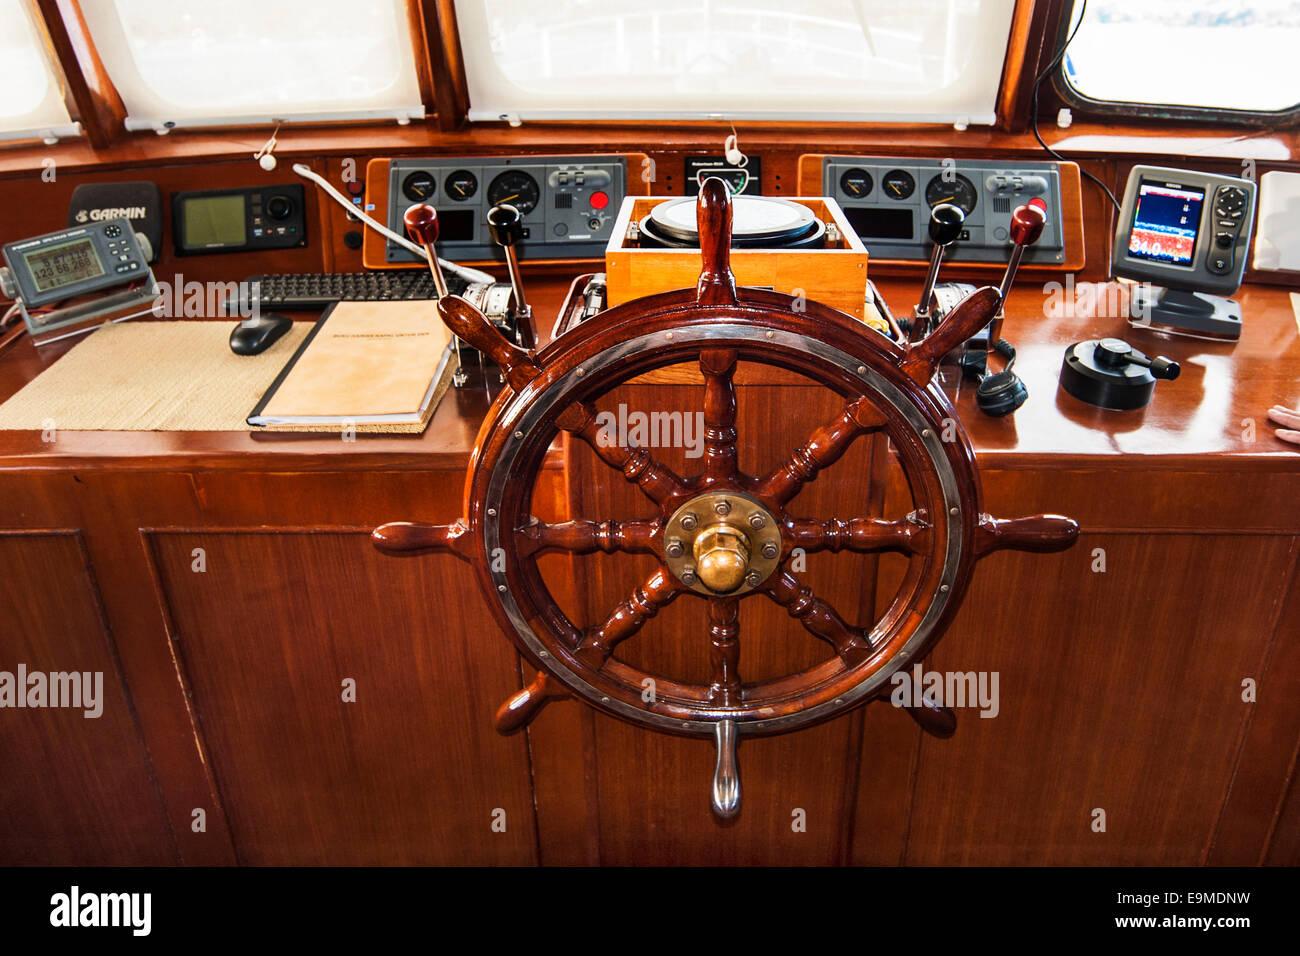 Steering wheel on the bridge of Pelagian liveaboard, Wakatobi Dive Resort, Sulawesi, Indonesia - Stock Image